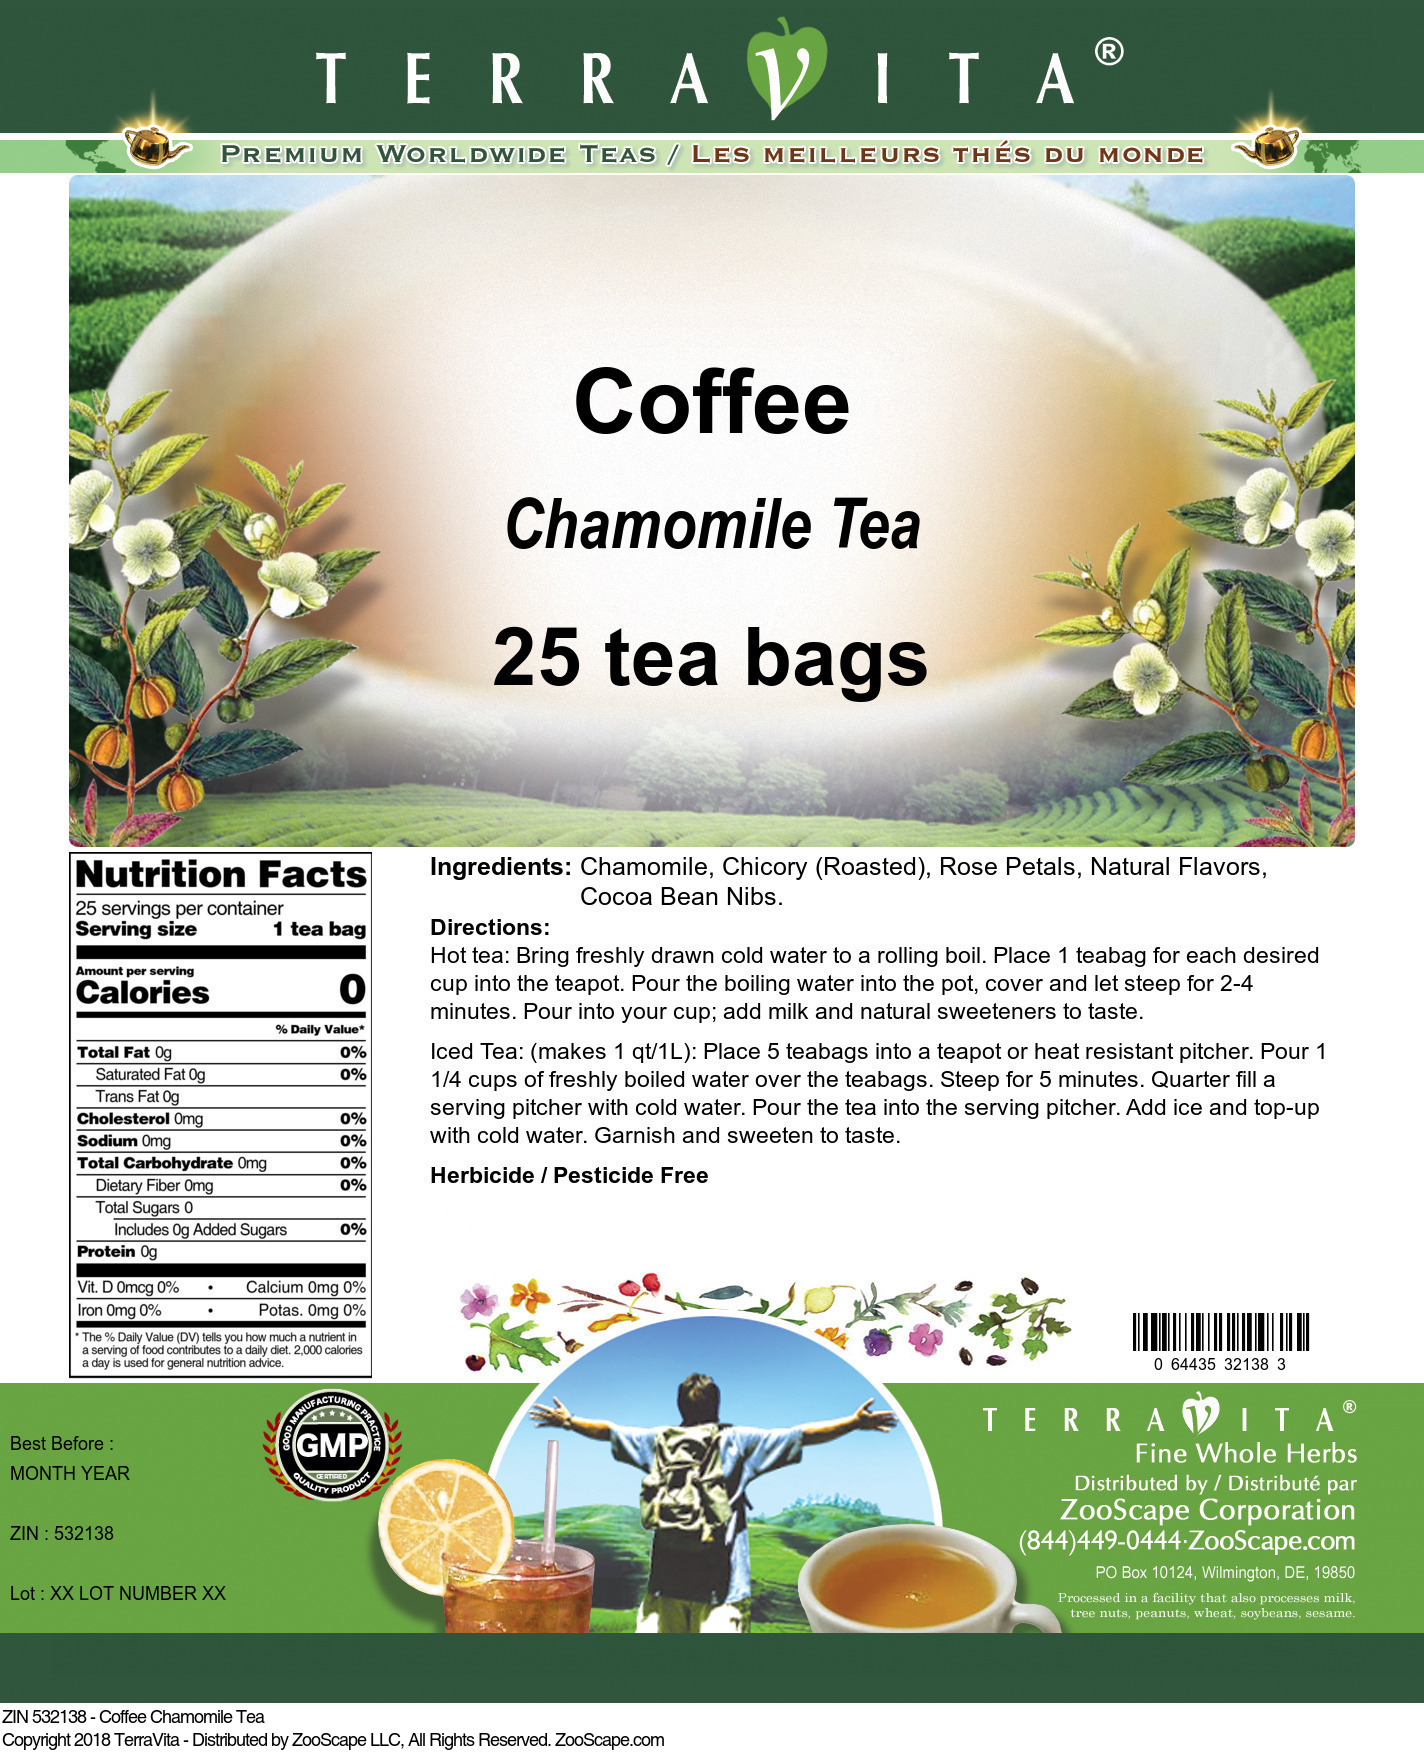 Coffee Chamomile Tea